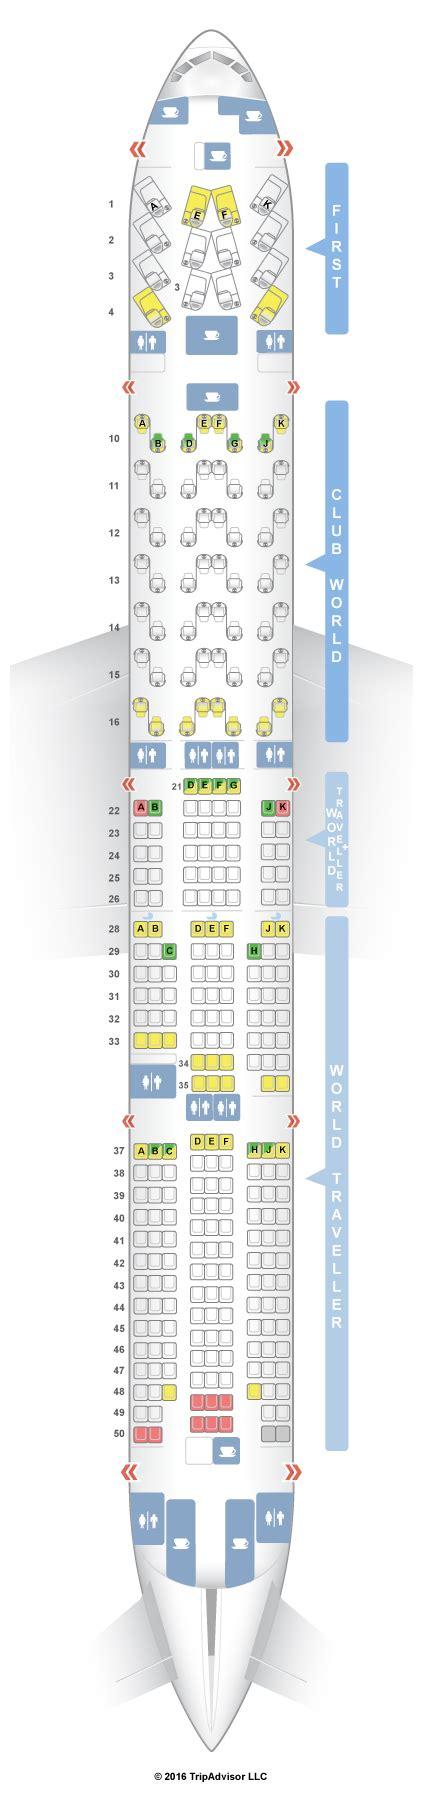 ba 777 seat map seatguru seat map airways boeing 777 300 773